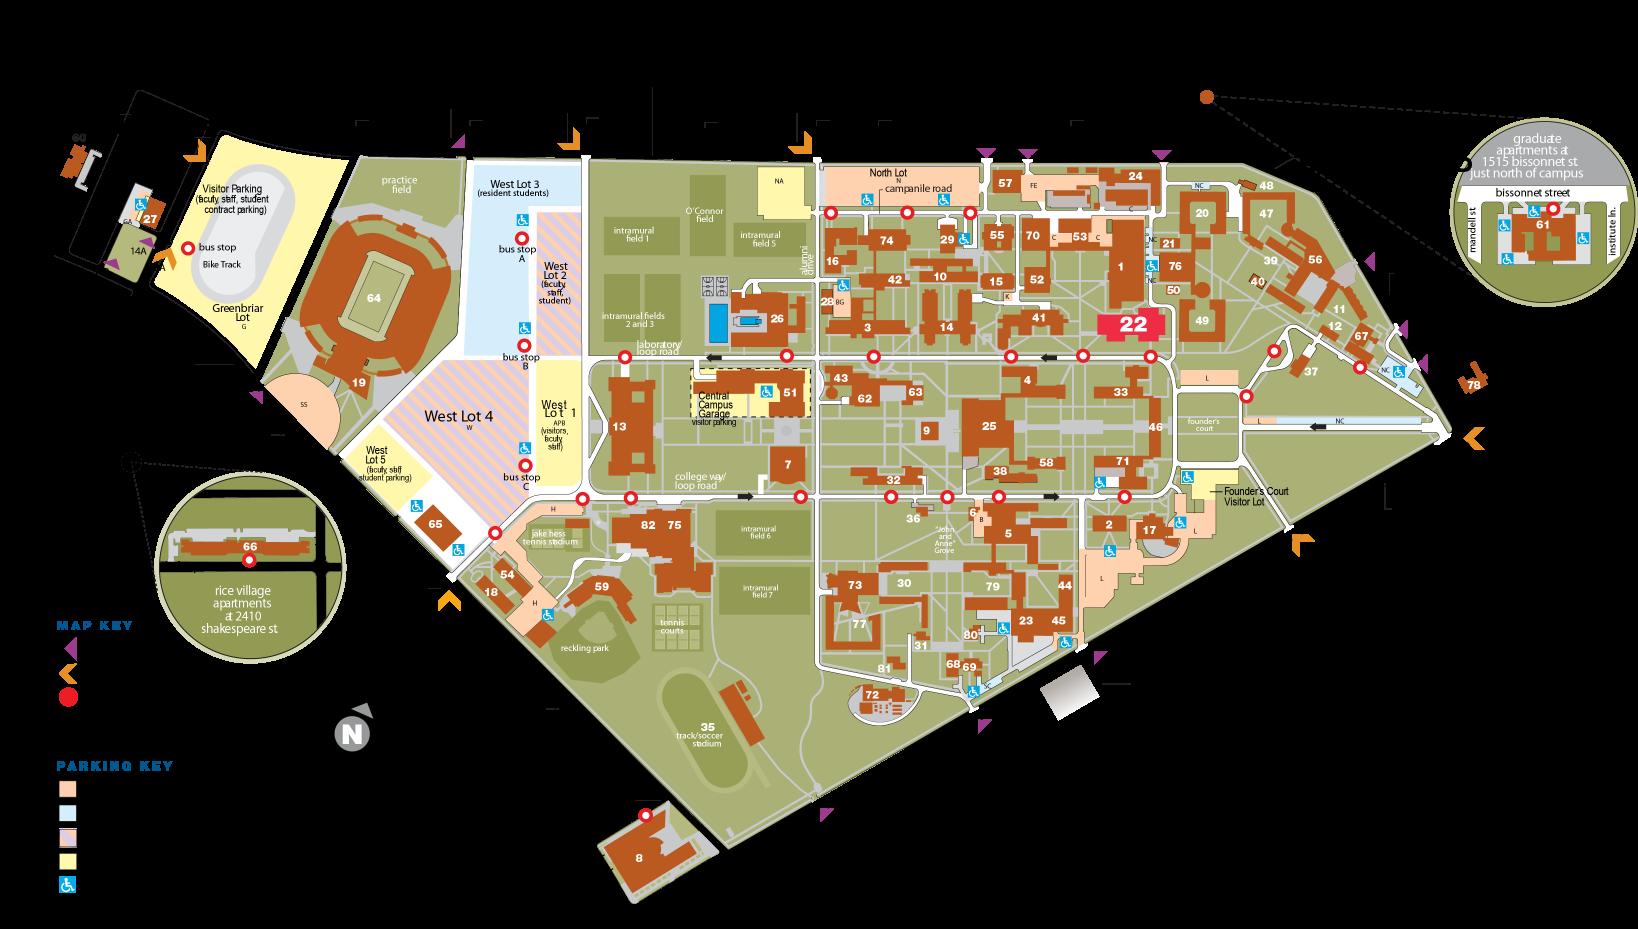 Rice University Map